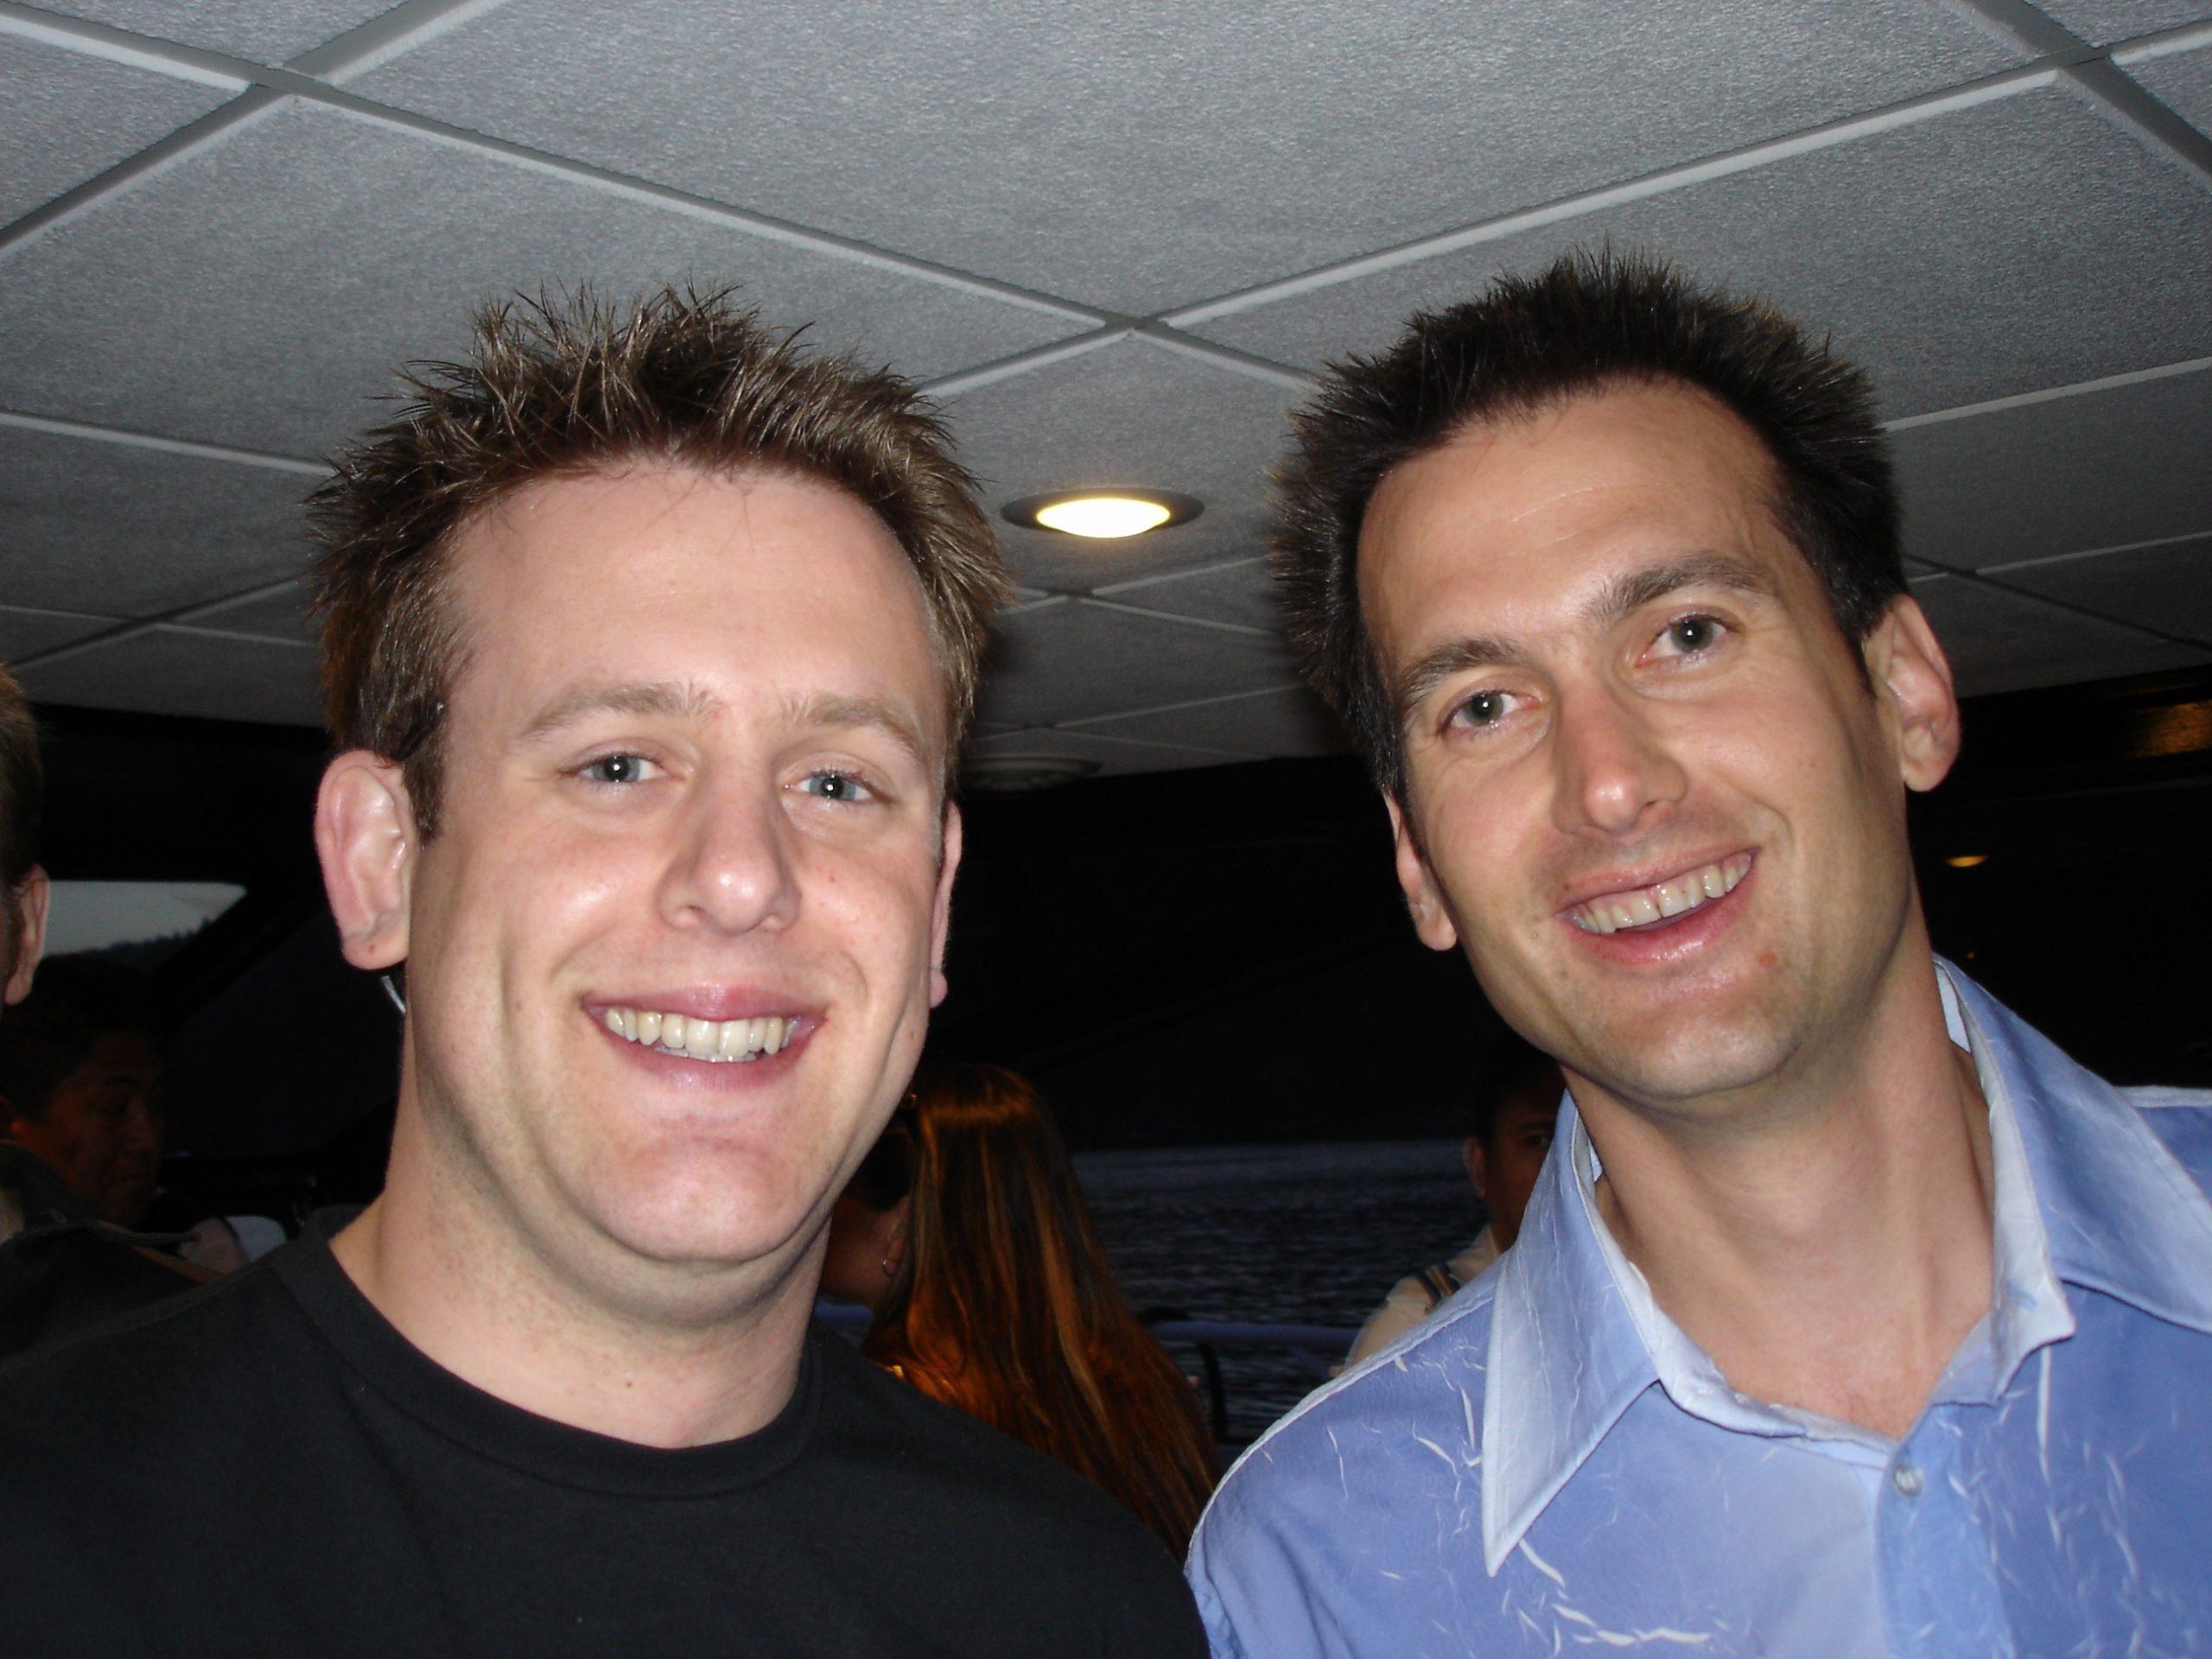 Derek Gehl & Corey Rudl